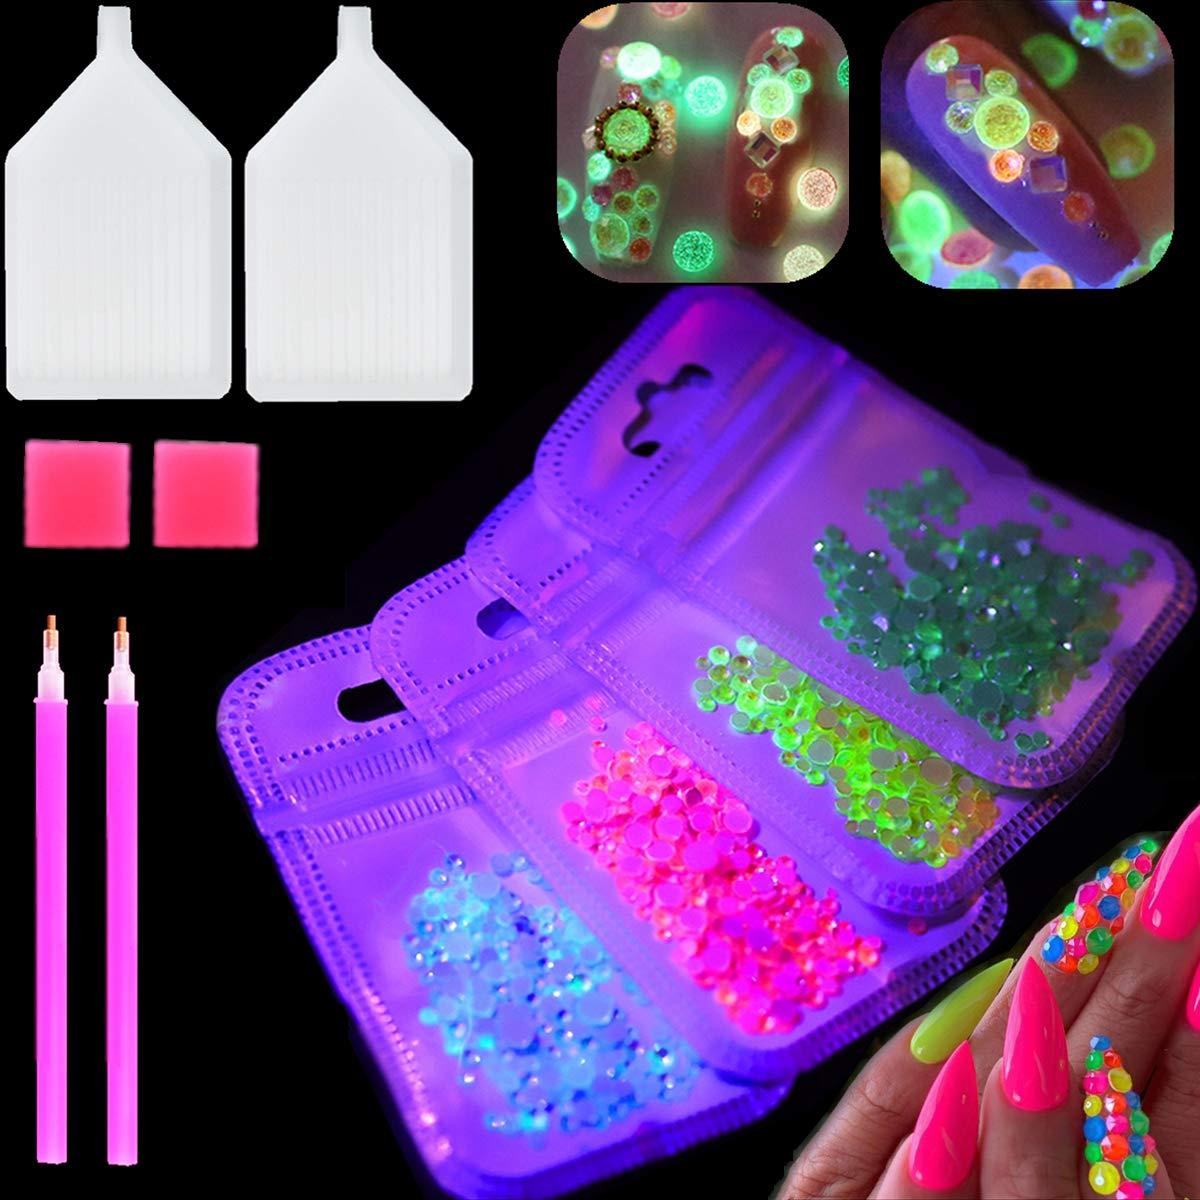 3D Luminous Nail Art Rhinestones Gems Kit Party Theme Glow in Dark Fluorescent NEON Night Light Nail Charms Crystals Diamonds with Storage Organizer Box and Picker Pencil (luminous)